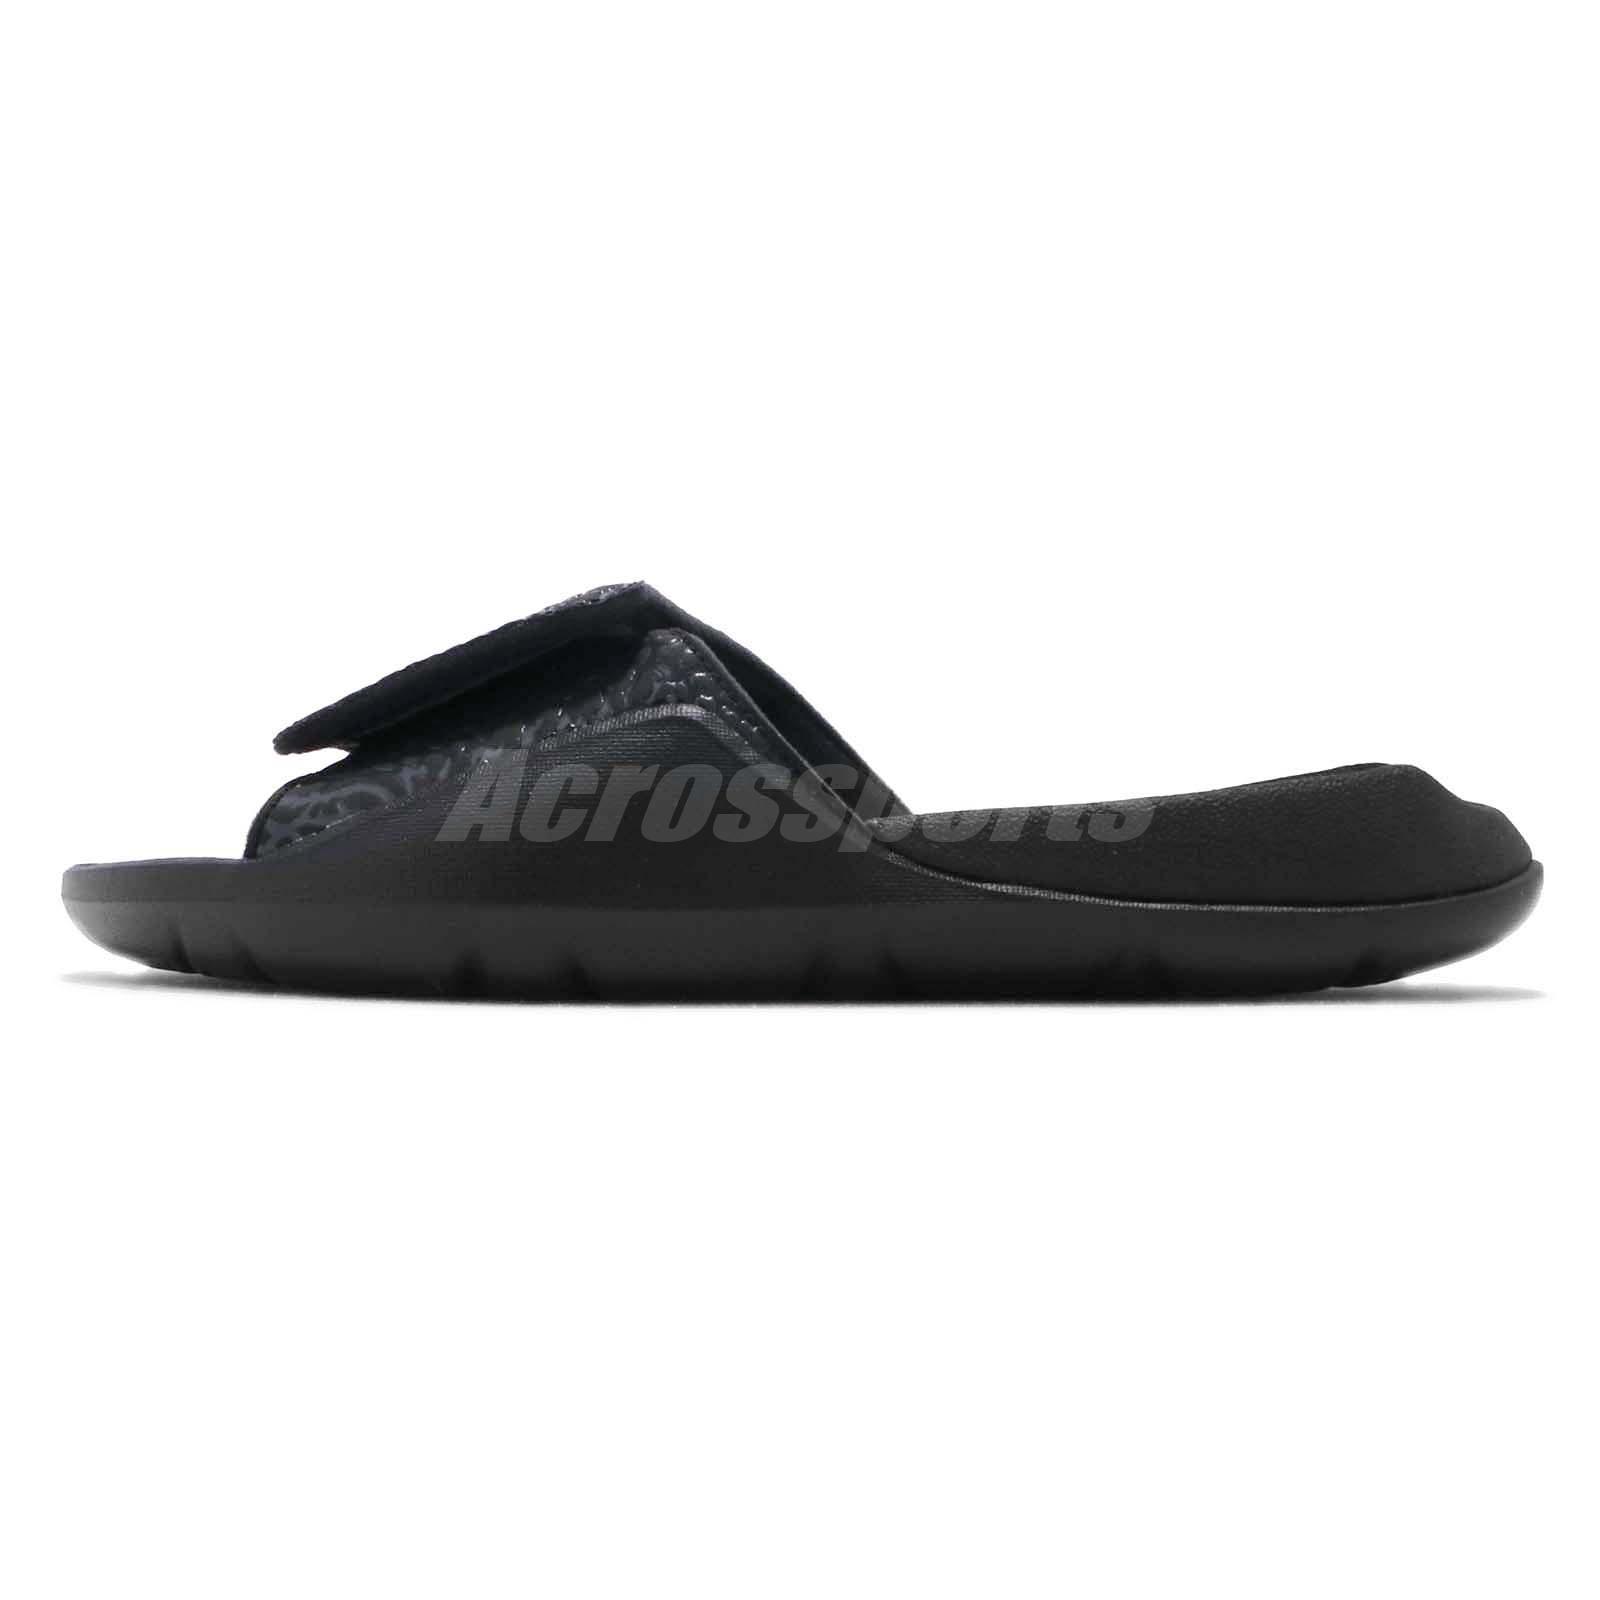 9806bf8ddf7387 Nike Jordan Hydro 7 V2 Black Gold Men Sports Sandals Slides Slippers ...